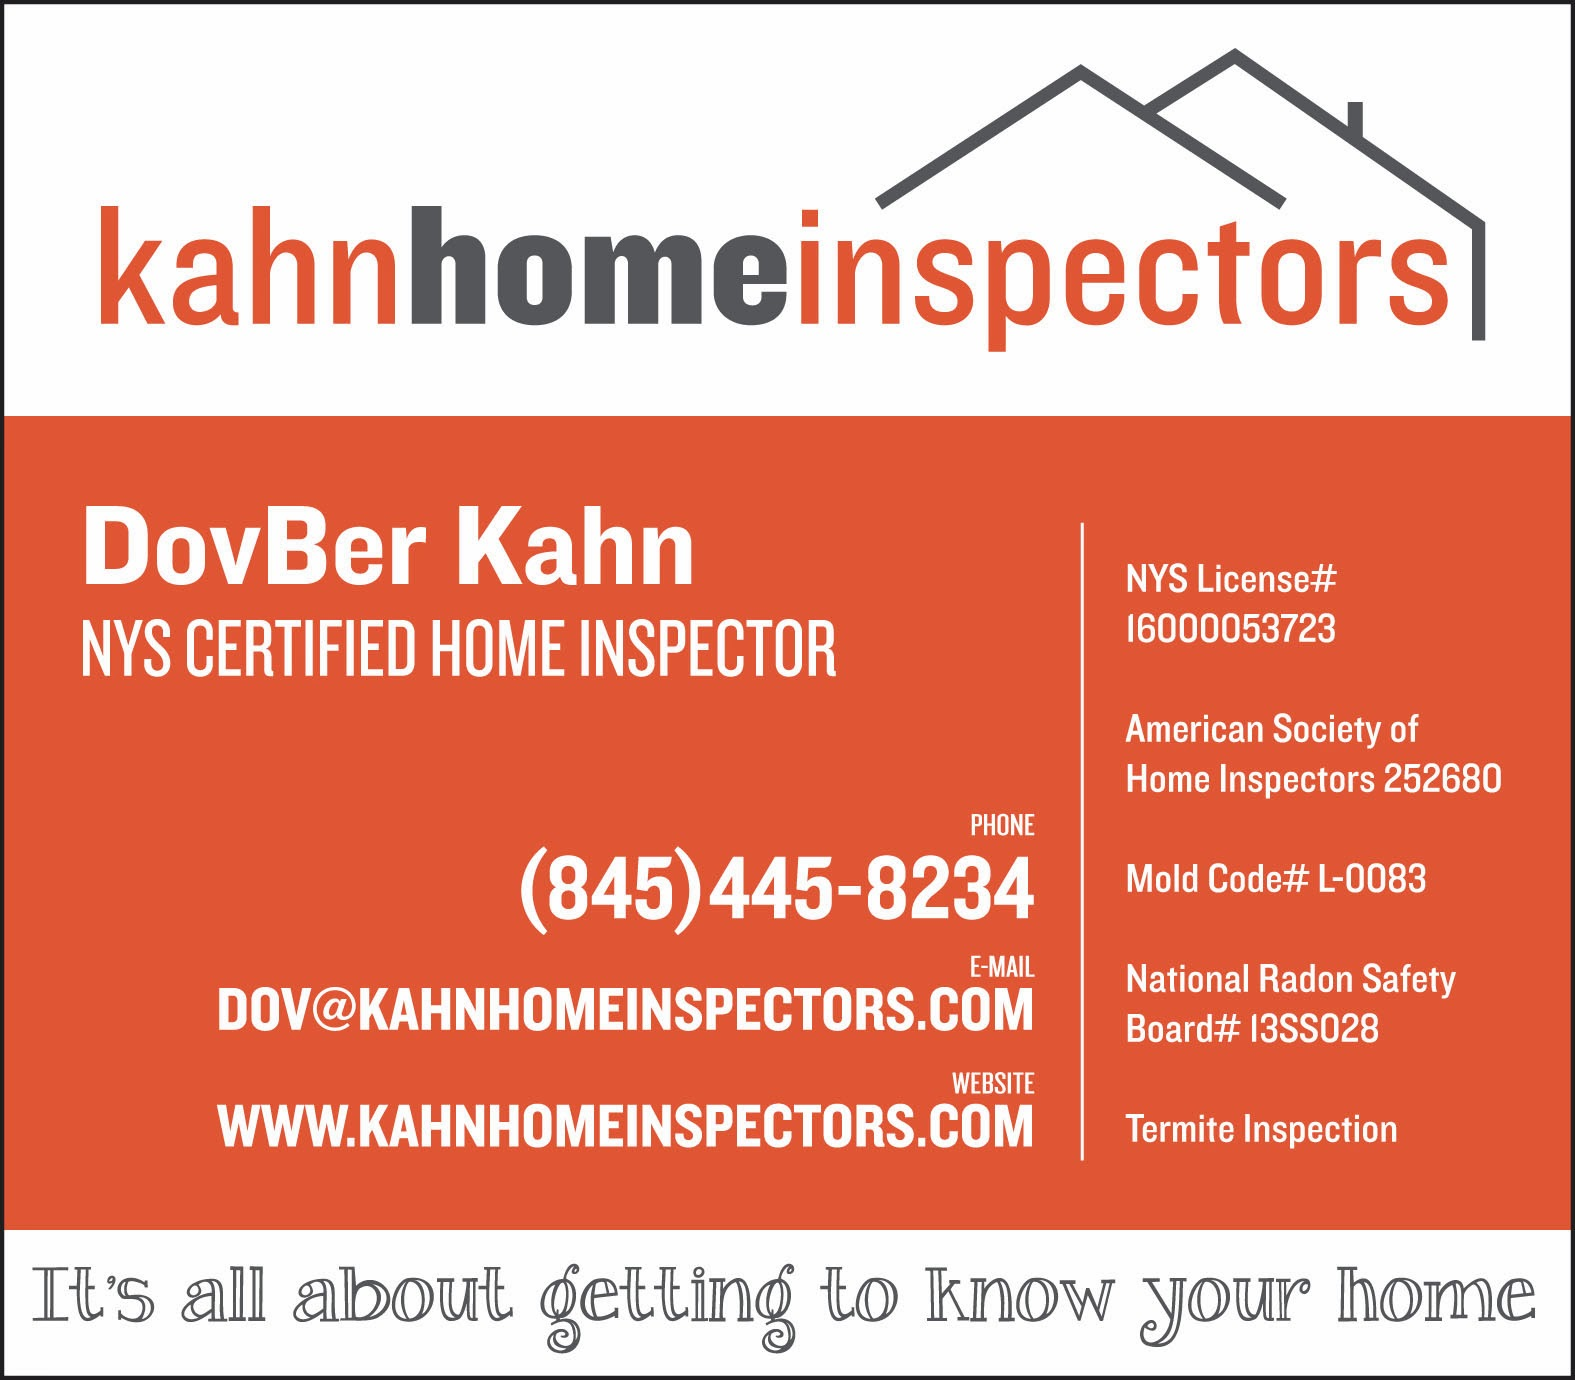 Kahn Home Inspectors